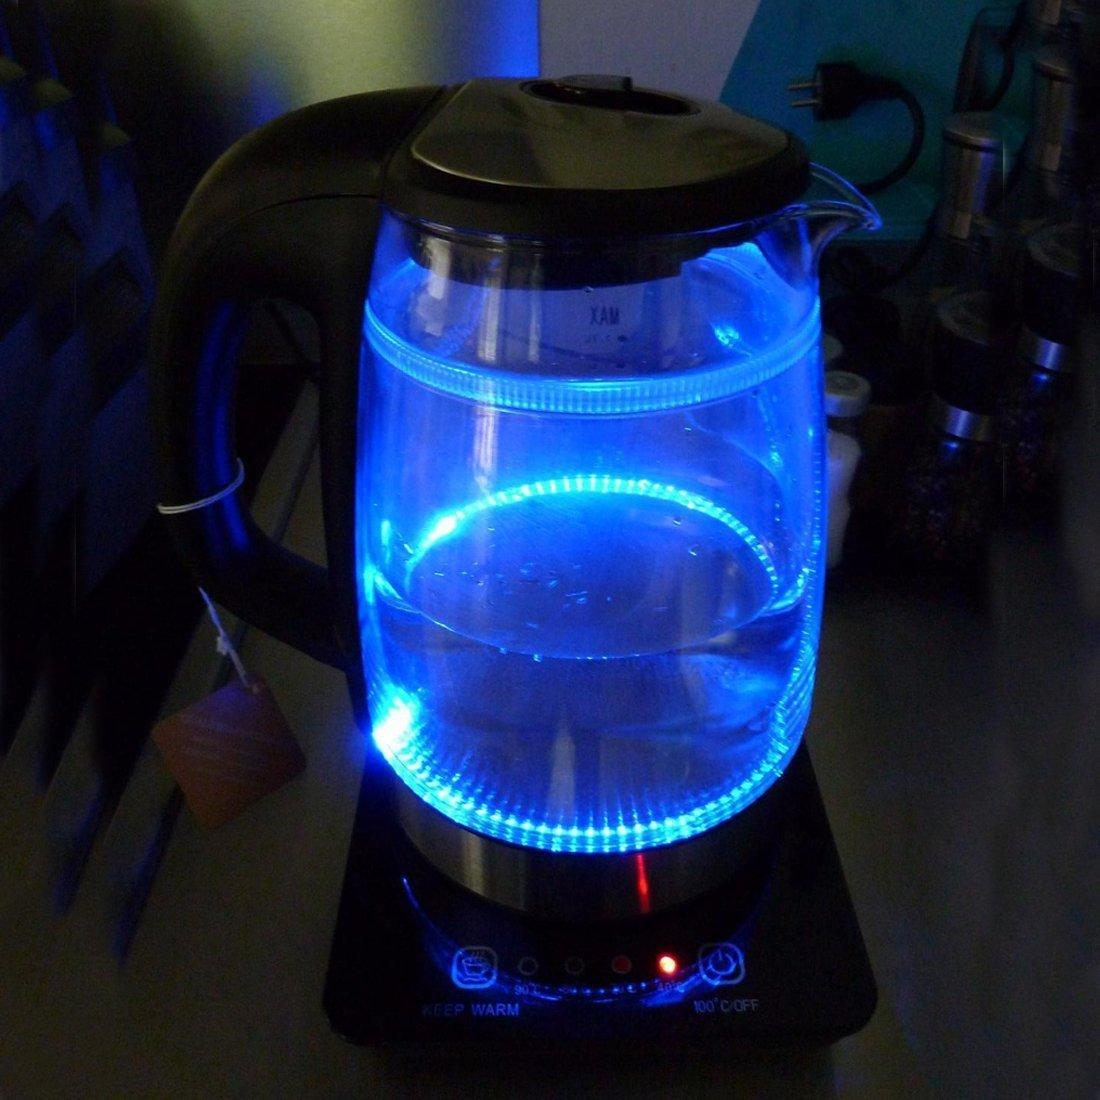 1,7/l, 2200/W color negro Kinden Hervidor de agua Cristal Acero Inoxidable Hervidor de agua t/é Hervidor Tetera Kettle inal/ámbrico LED de iluminaci/ón